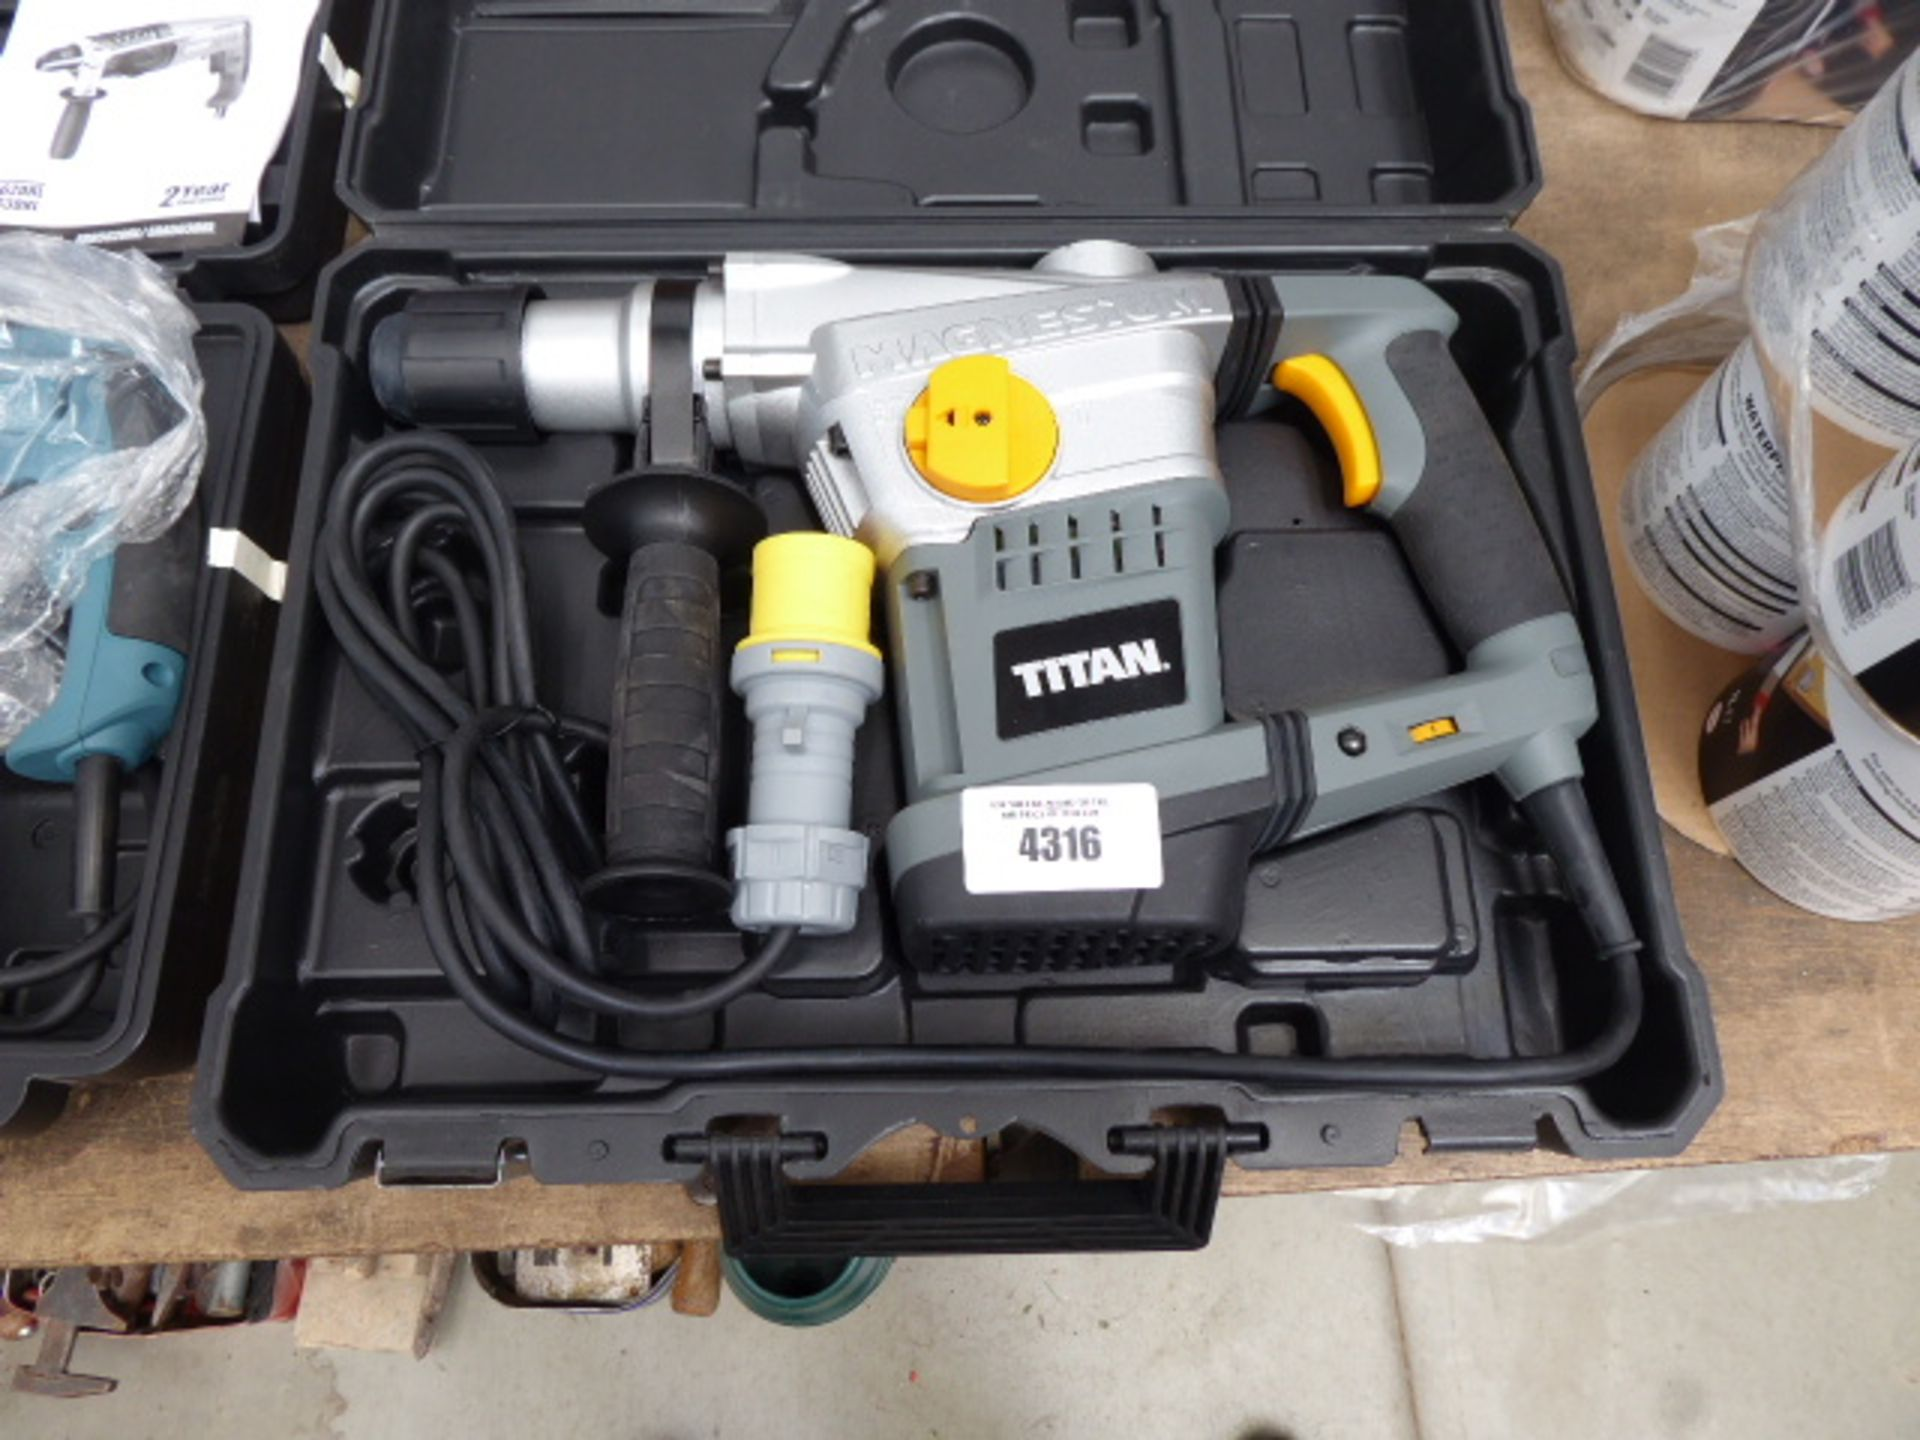 Lot 4316 - Titan Magnesium 110v breaker